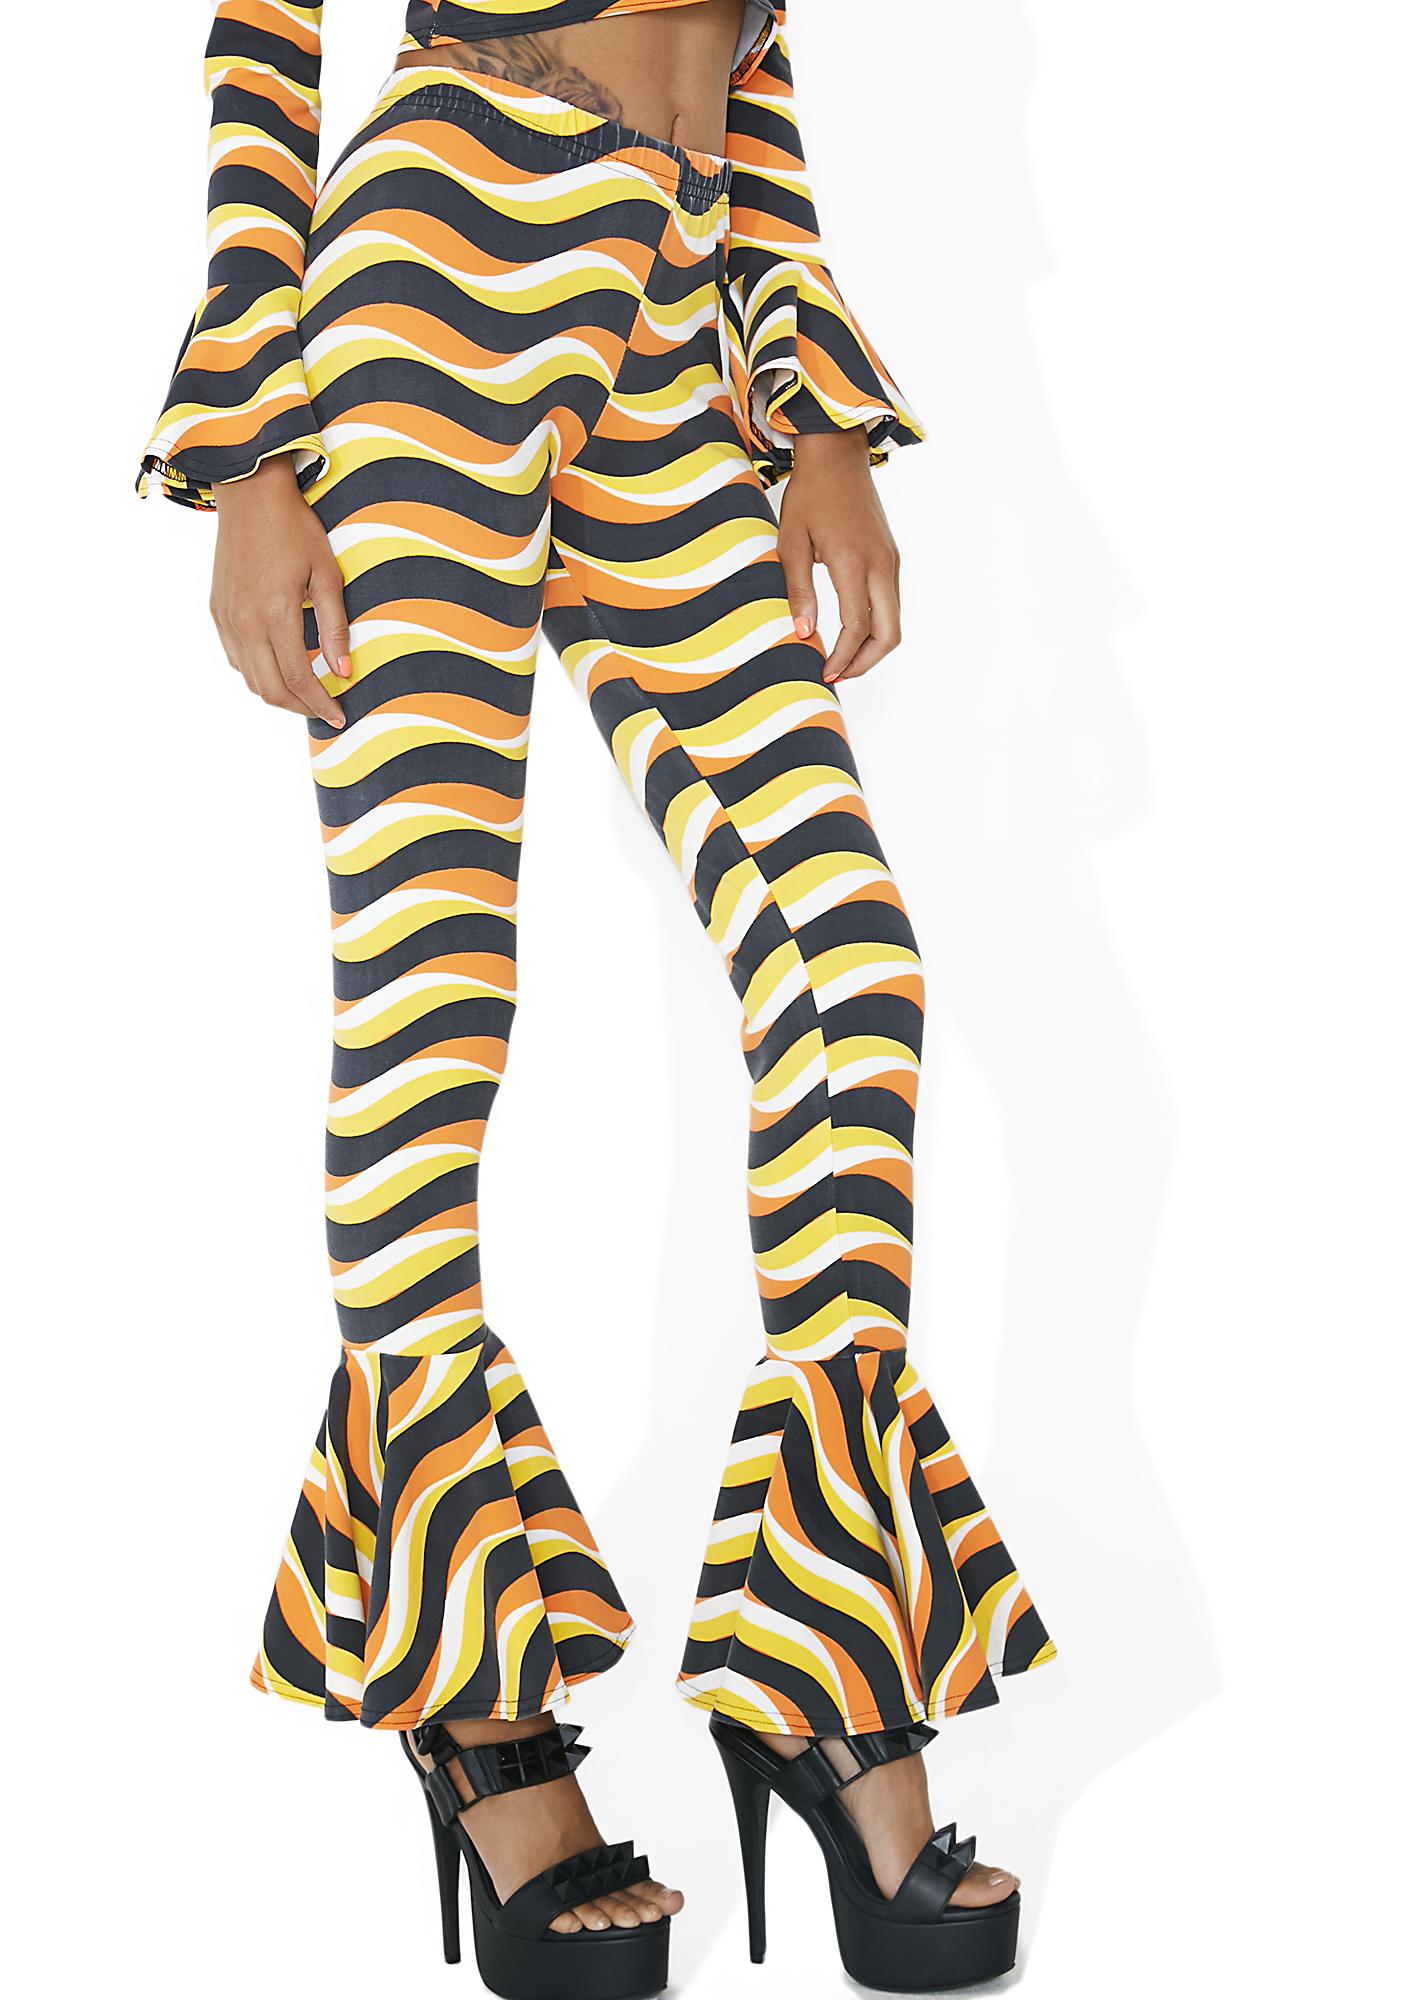 Wavy Mod Ruffle Pants